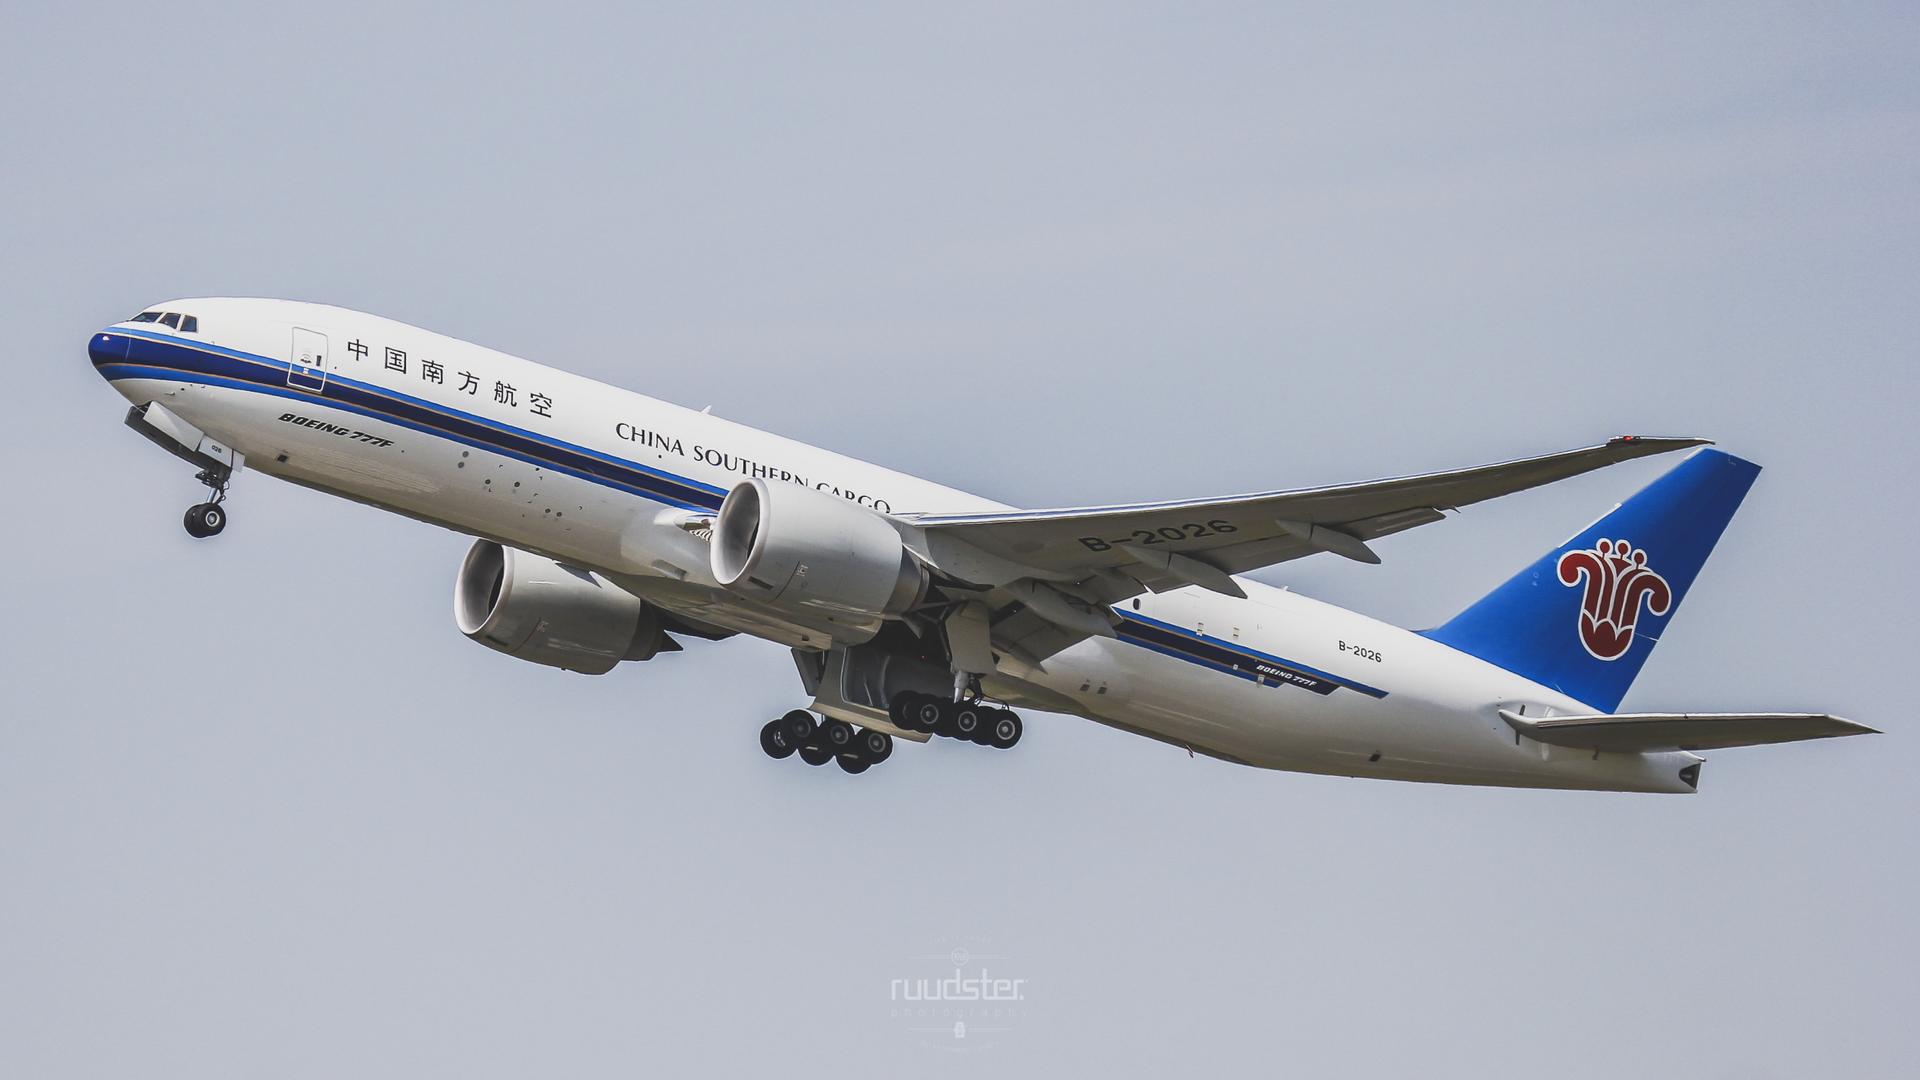 B-2026 | Build: 2015 - Boeing 777F